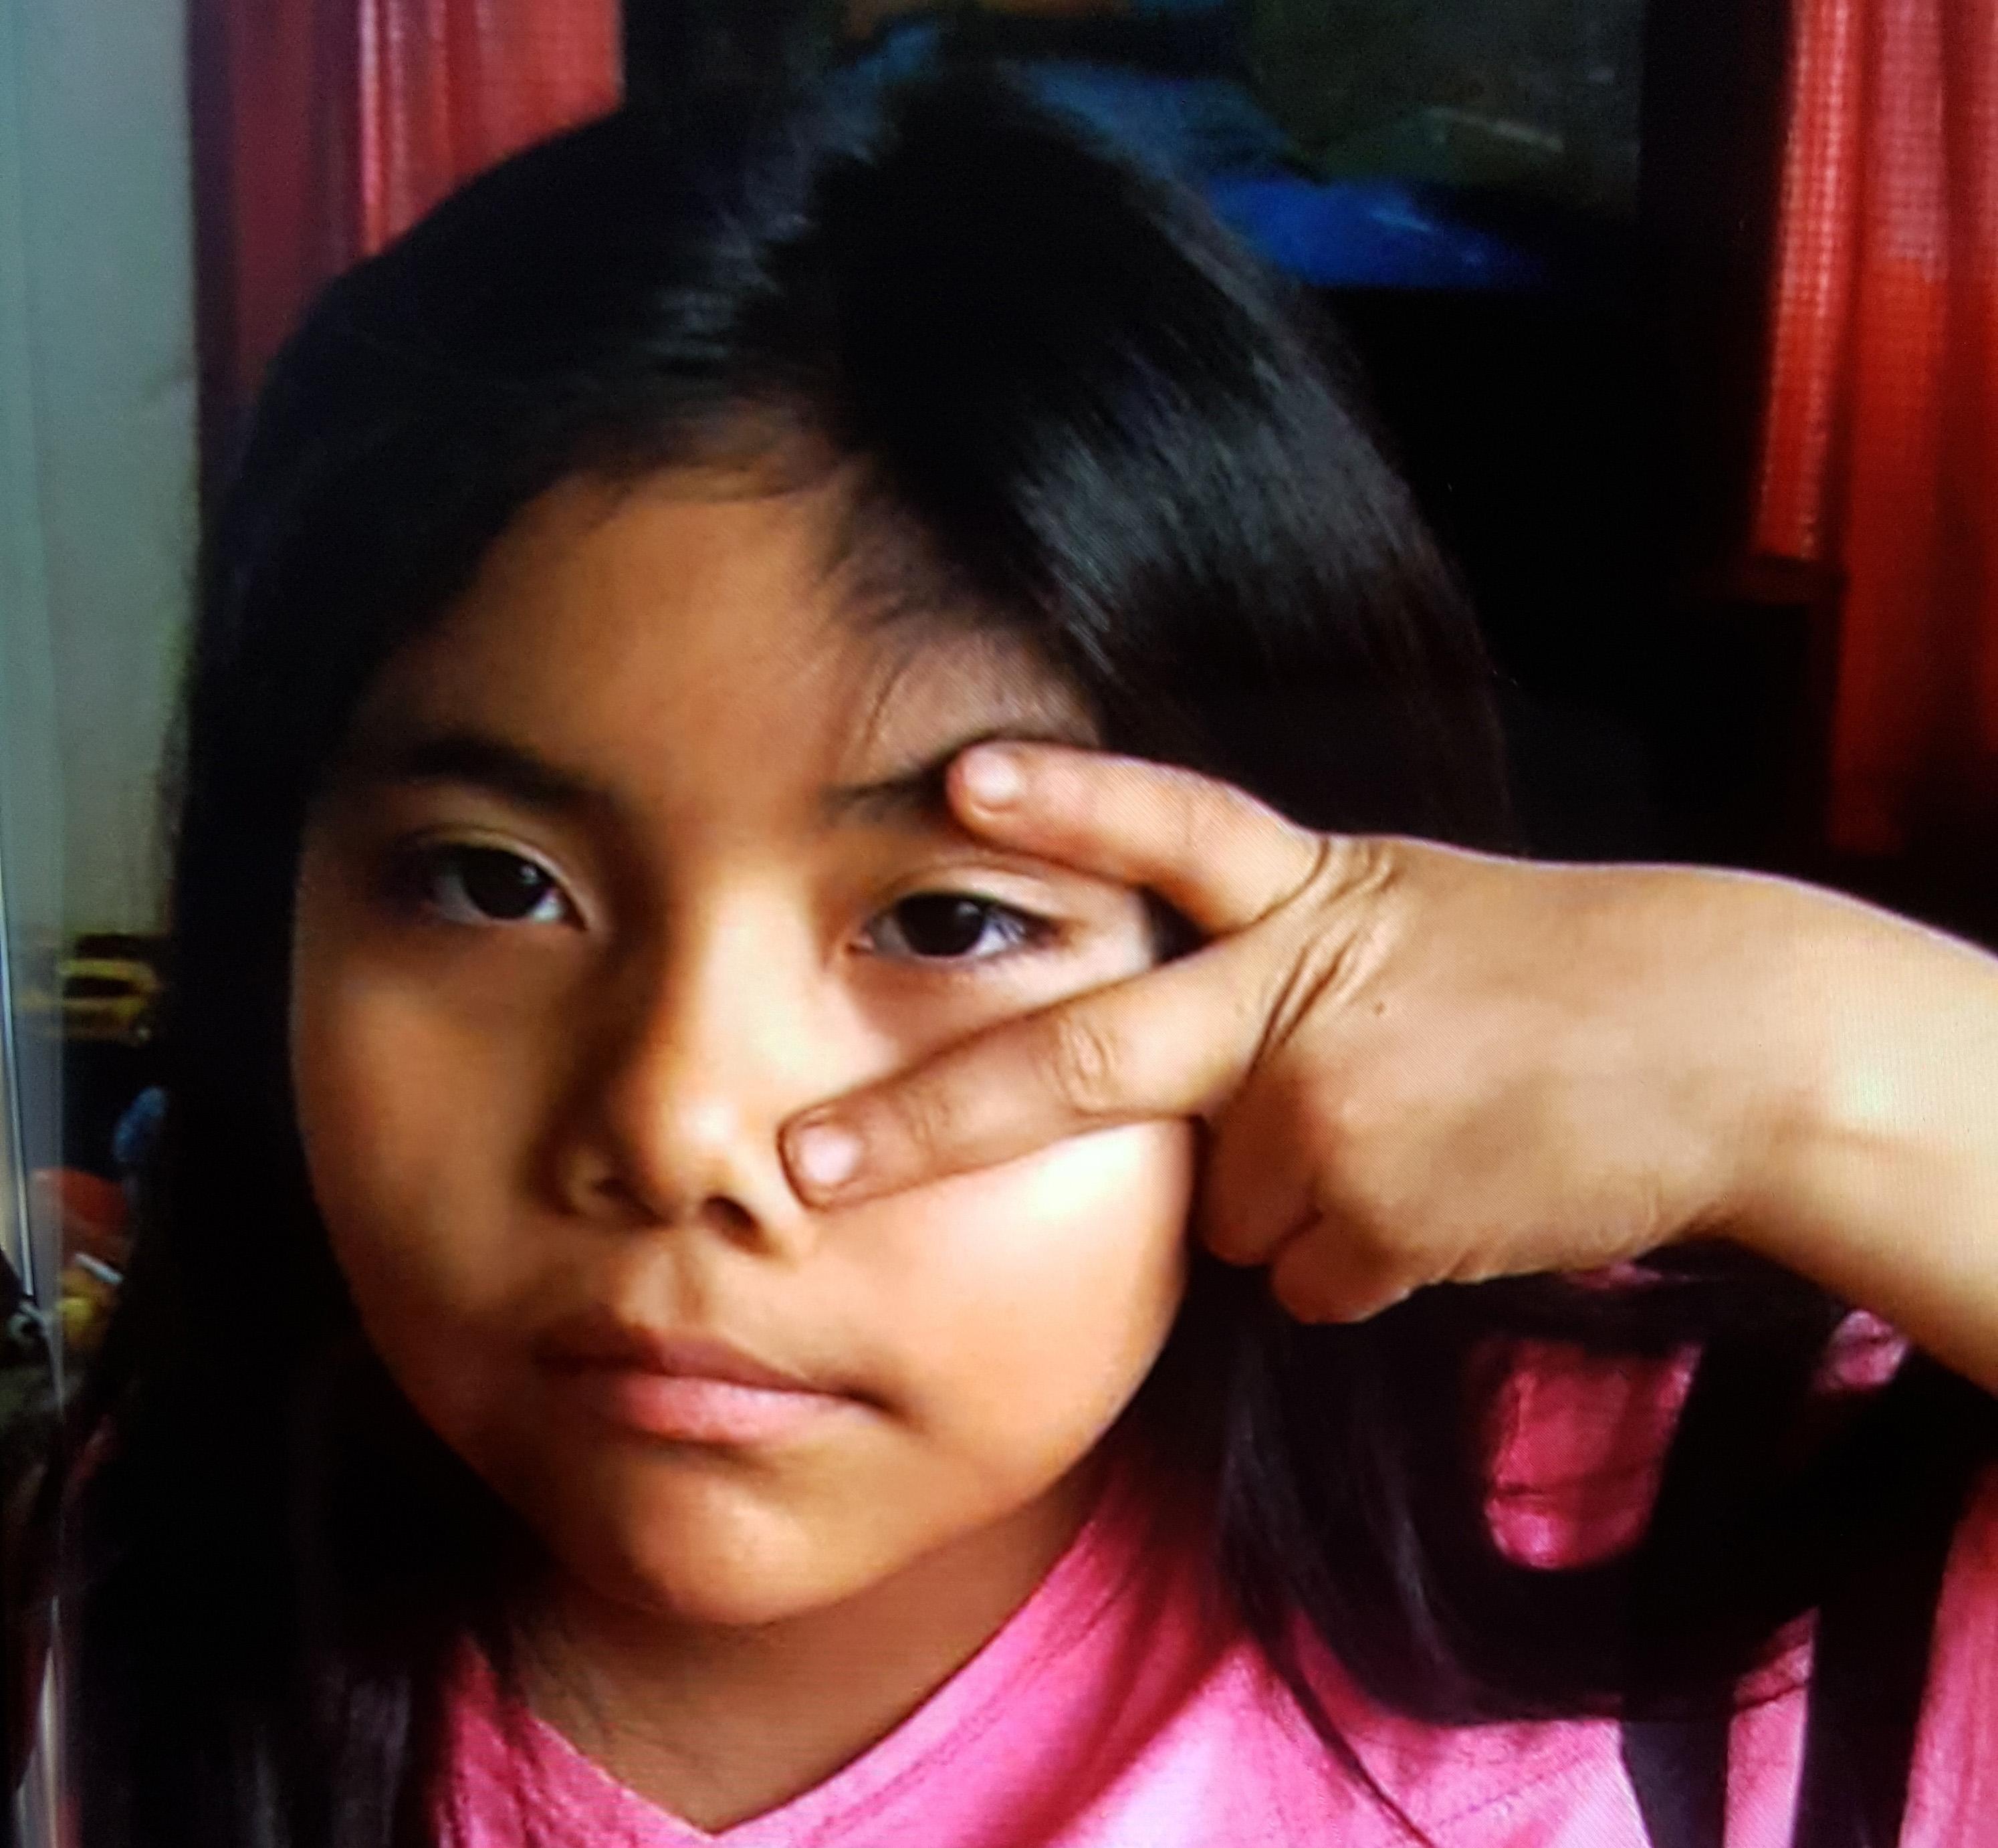 girl missing - photo #15